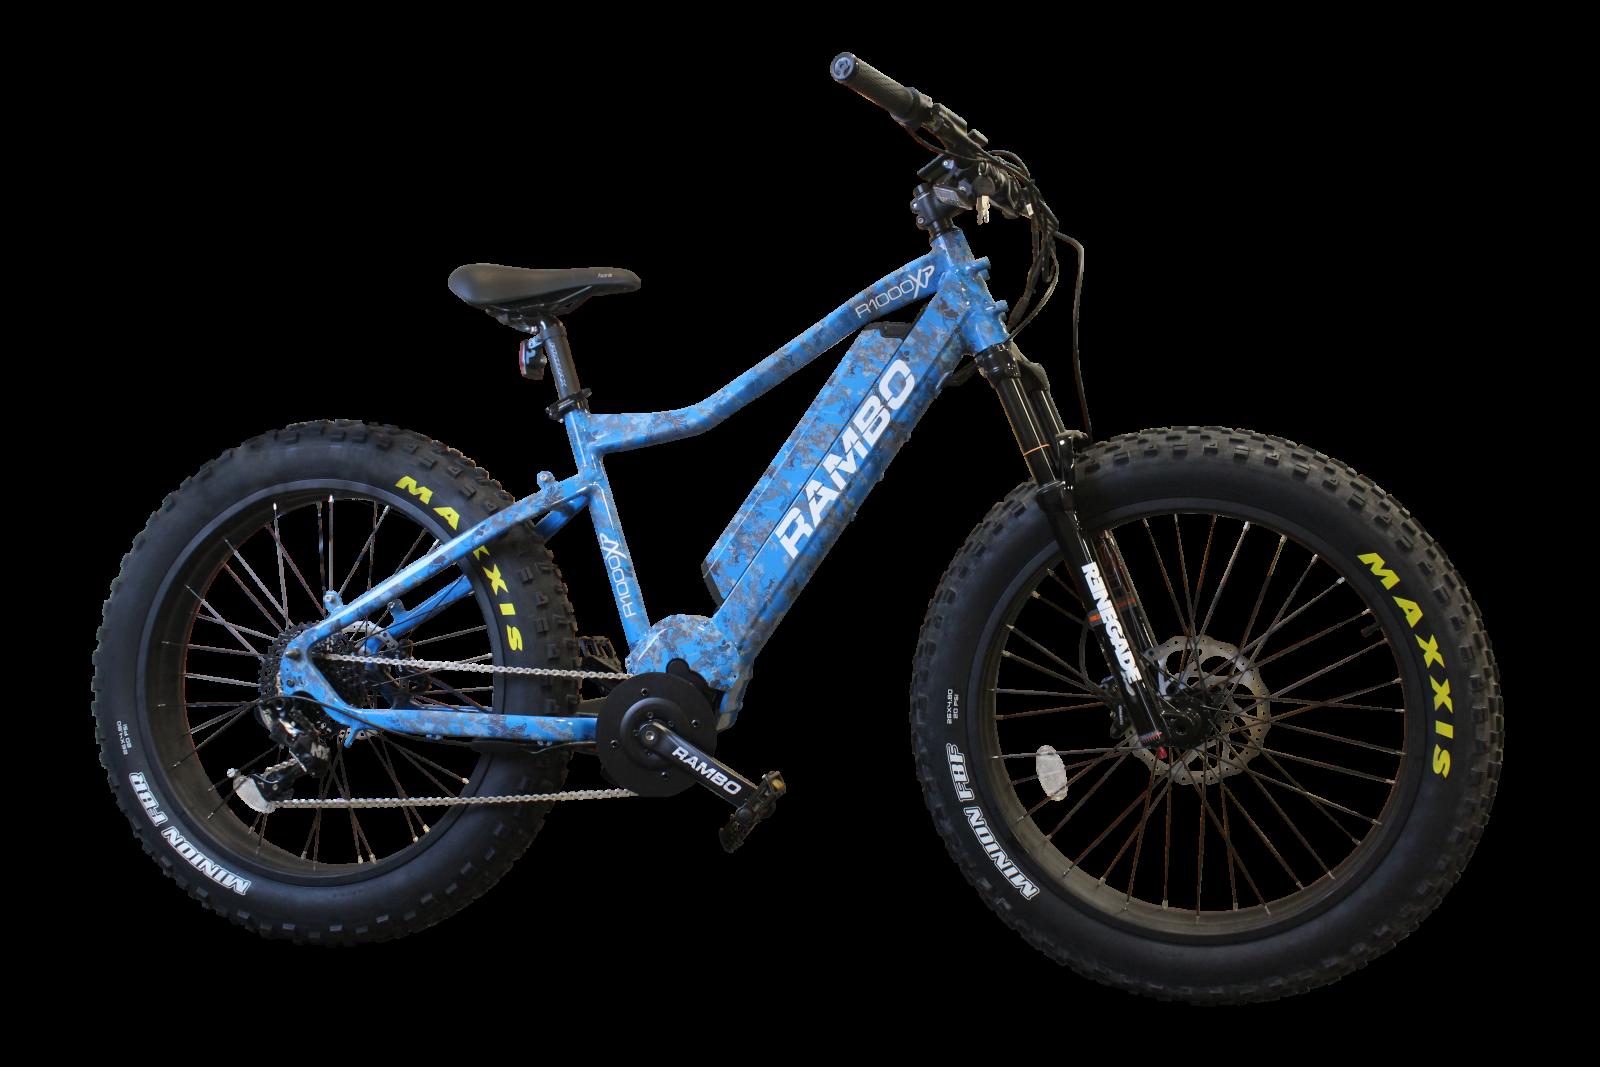 RAMBO 1000 XP BLUE